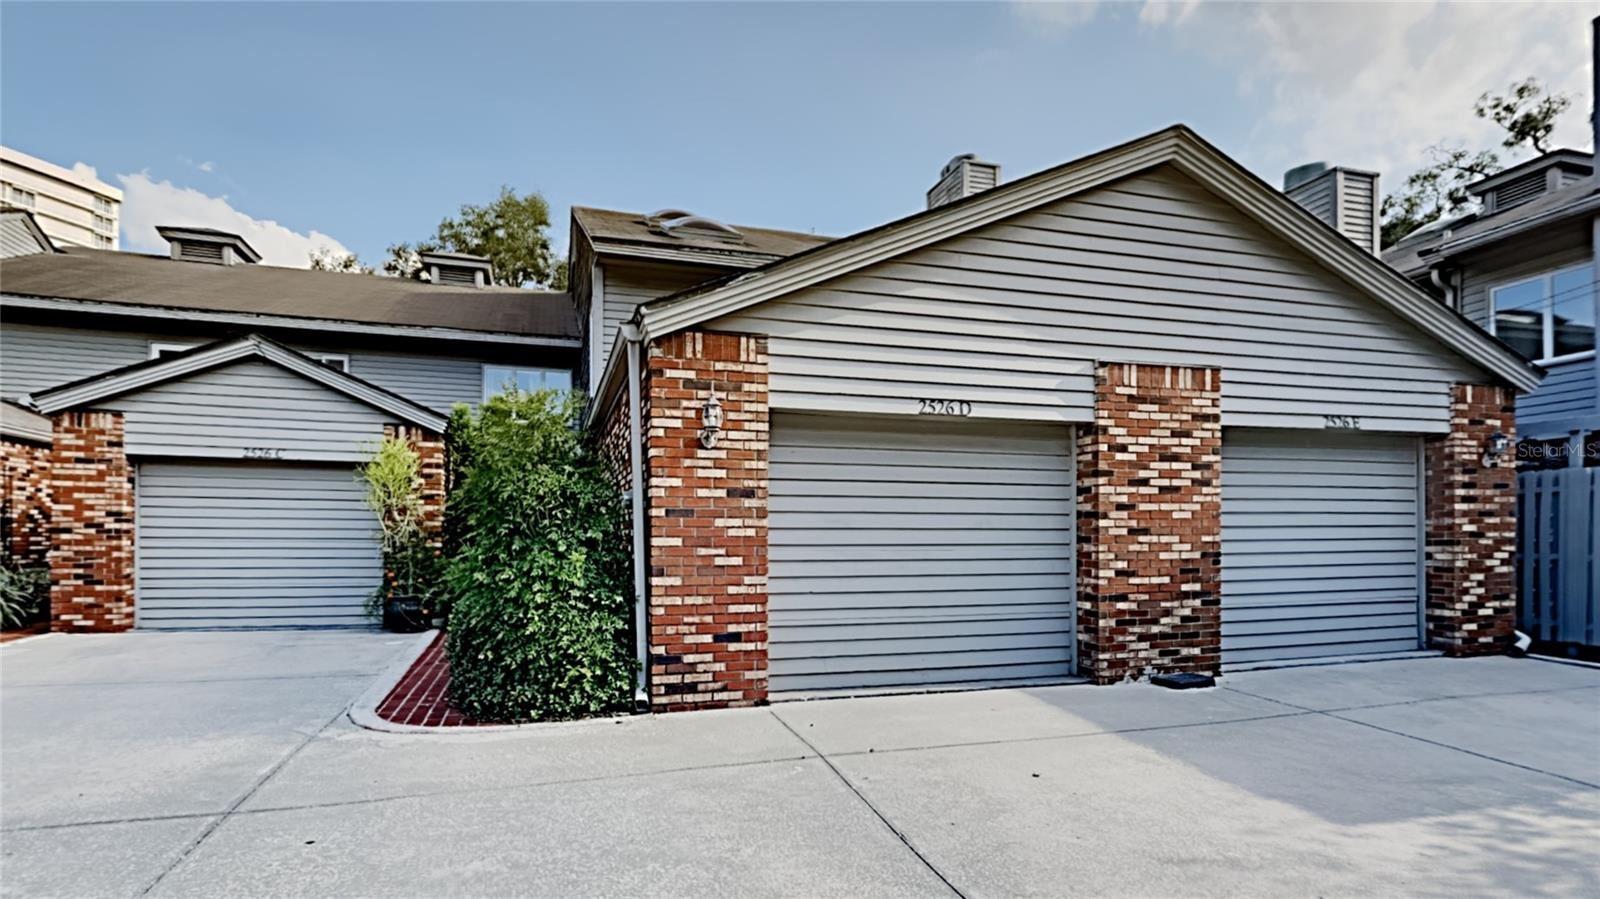 2526 W MARYLAND AVENUE #E, Tampa, FL 33629 - #: T3307560